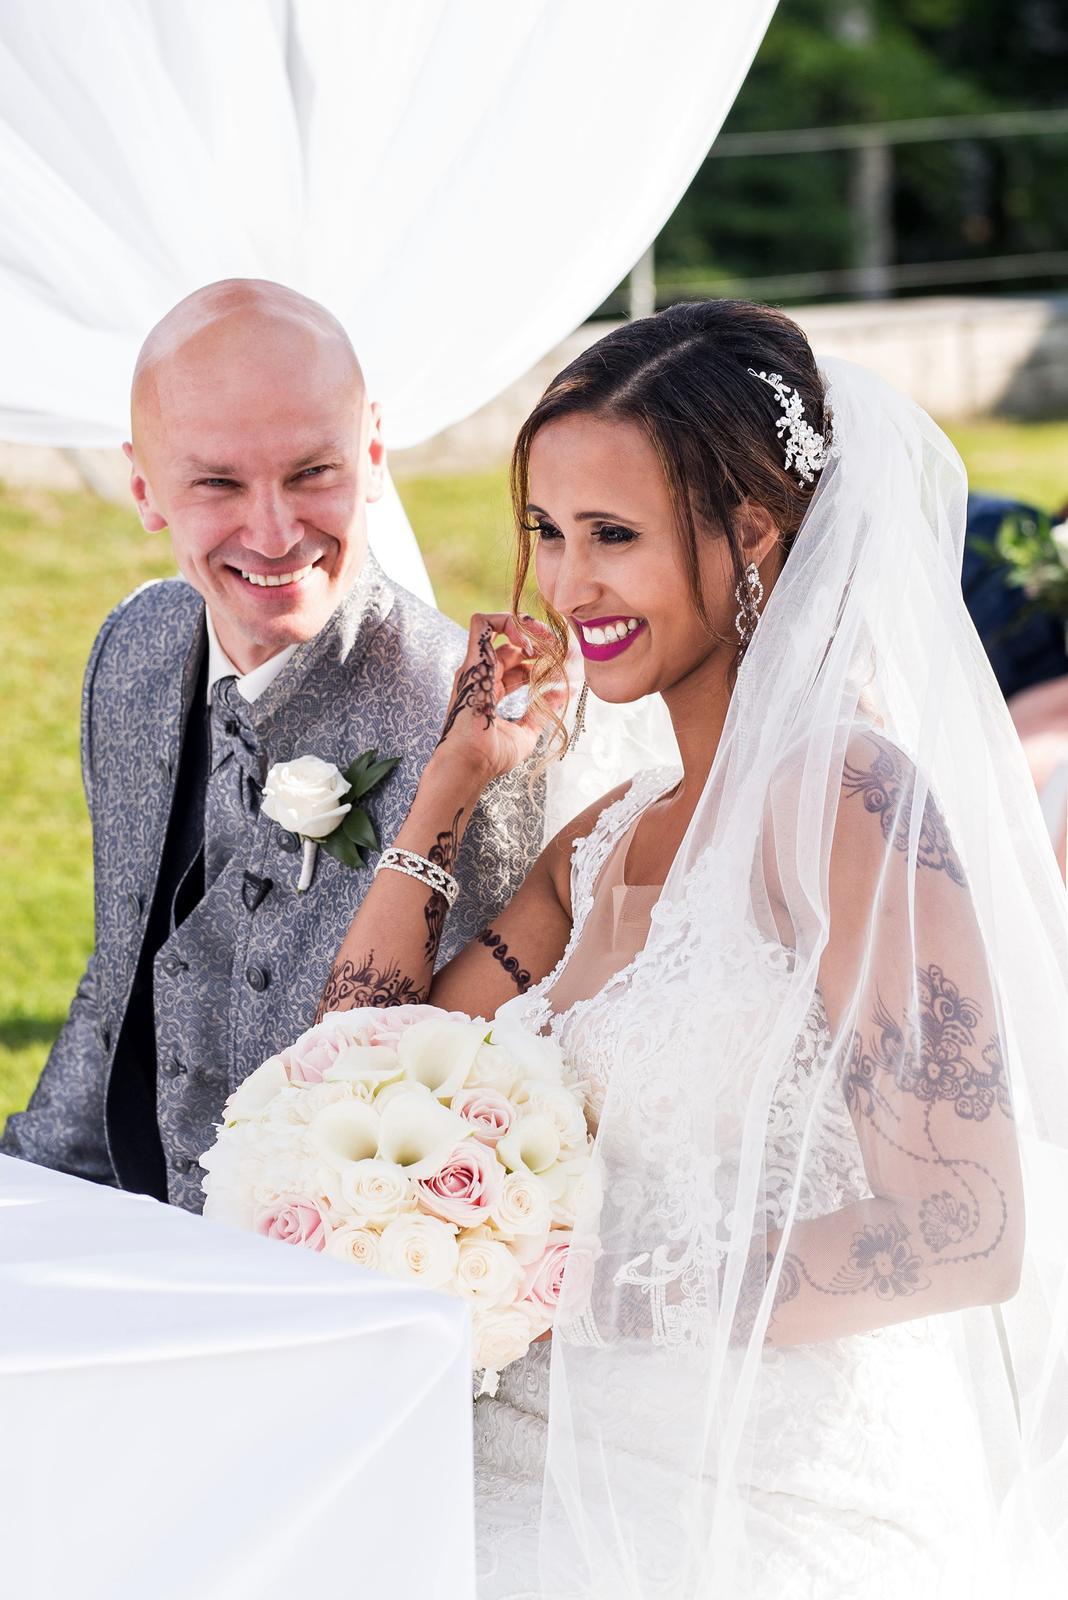 Svadba Zahra a Milan - Obrázok č. 35